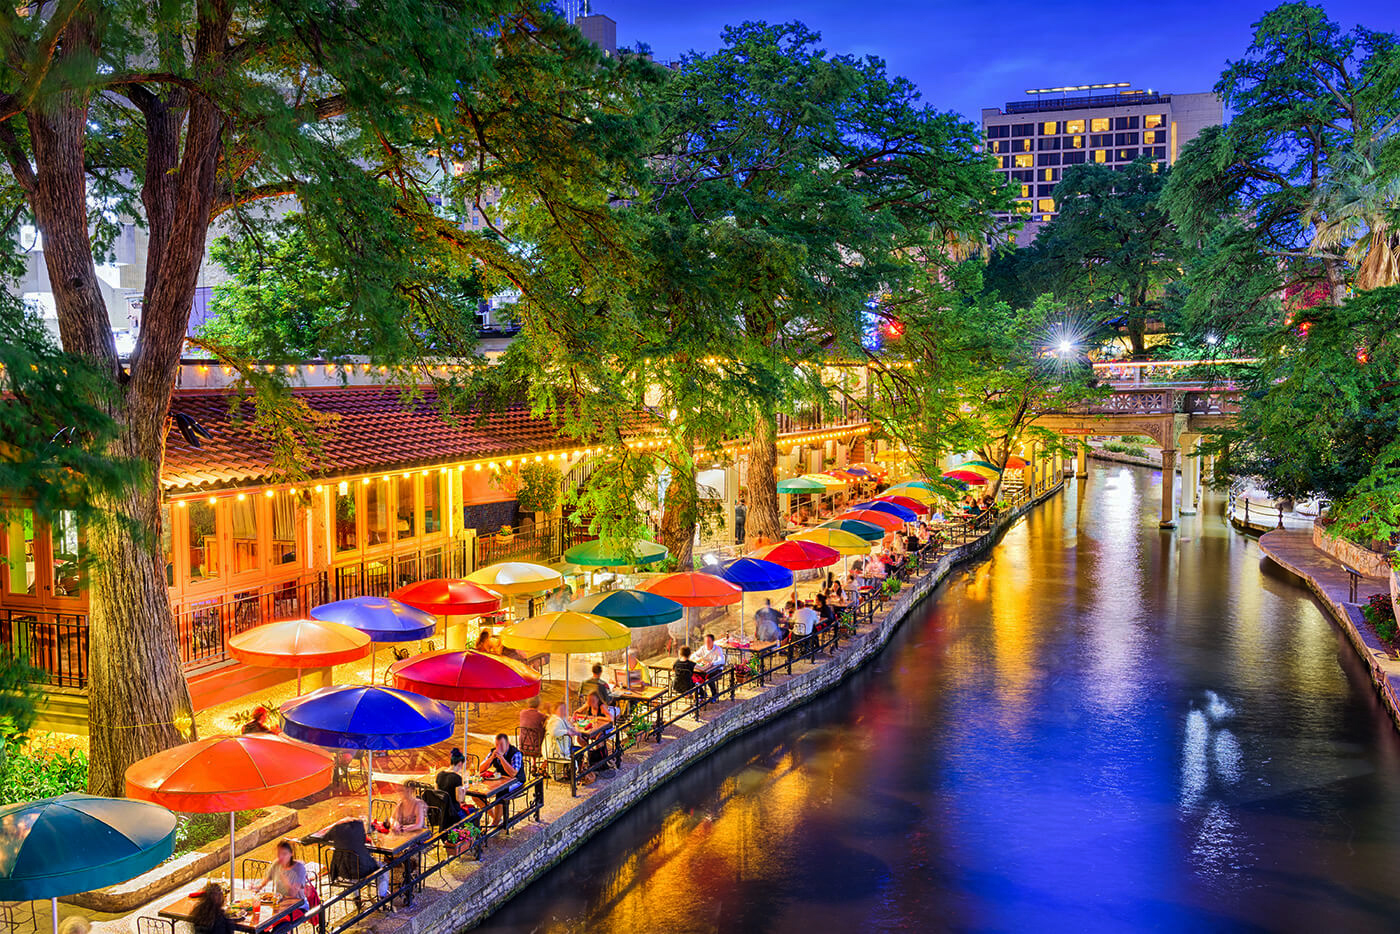 thành phố San Antonio, Texas